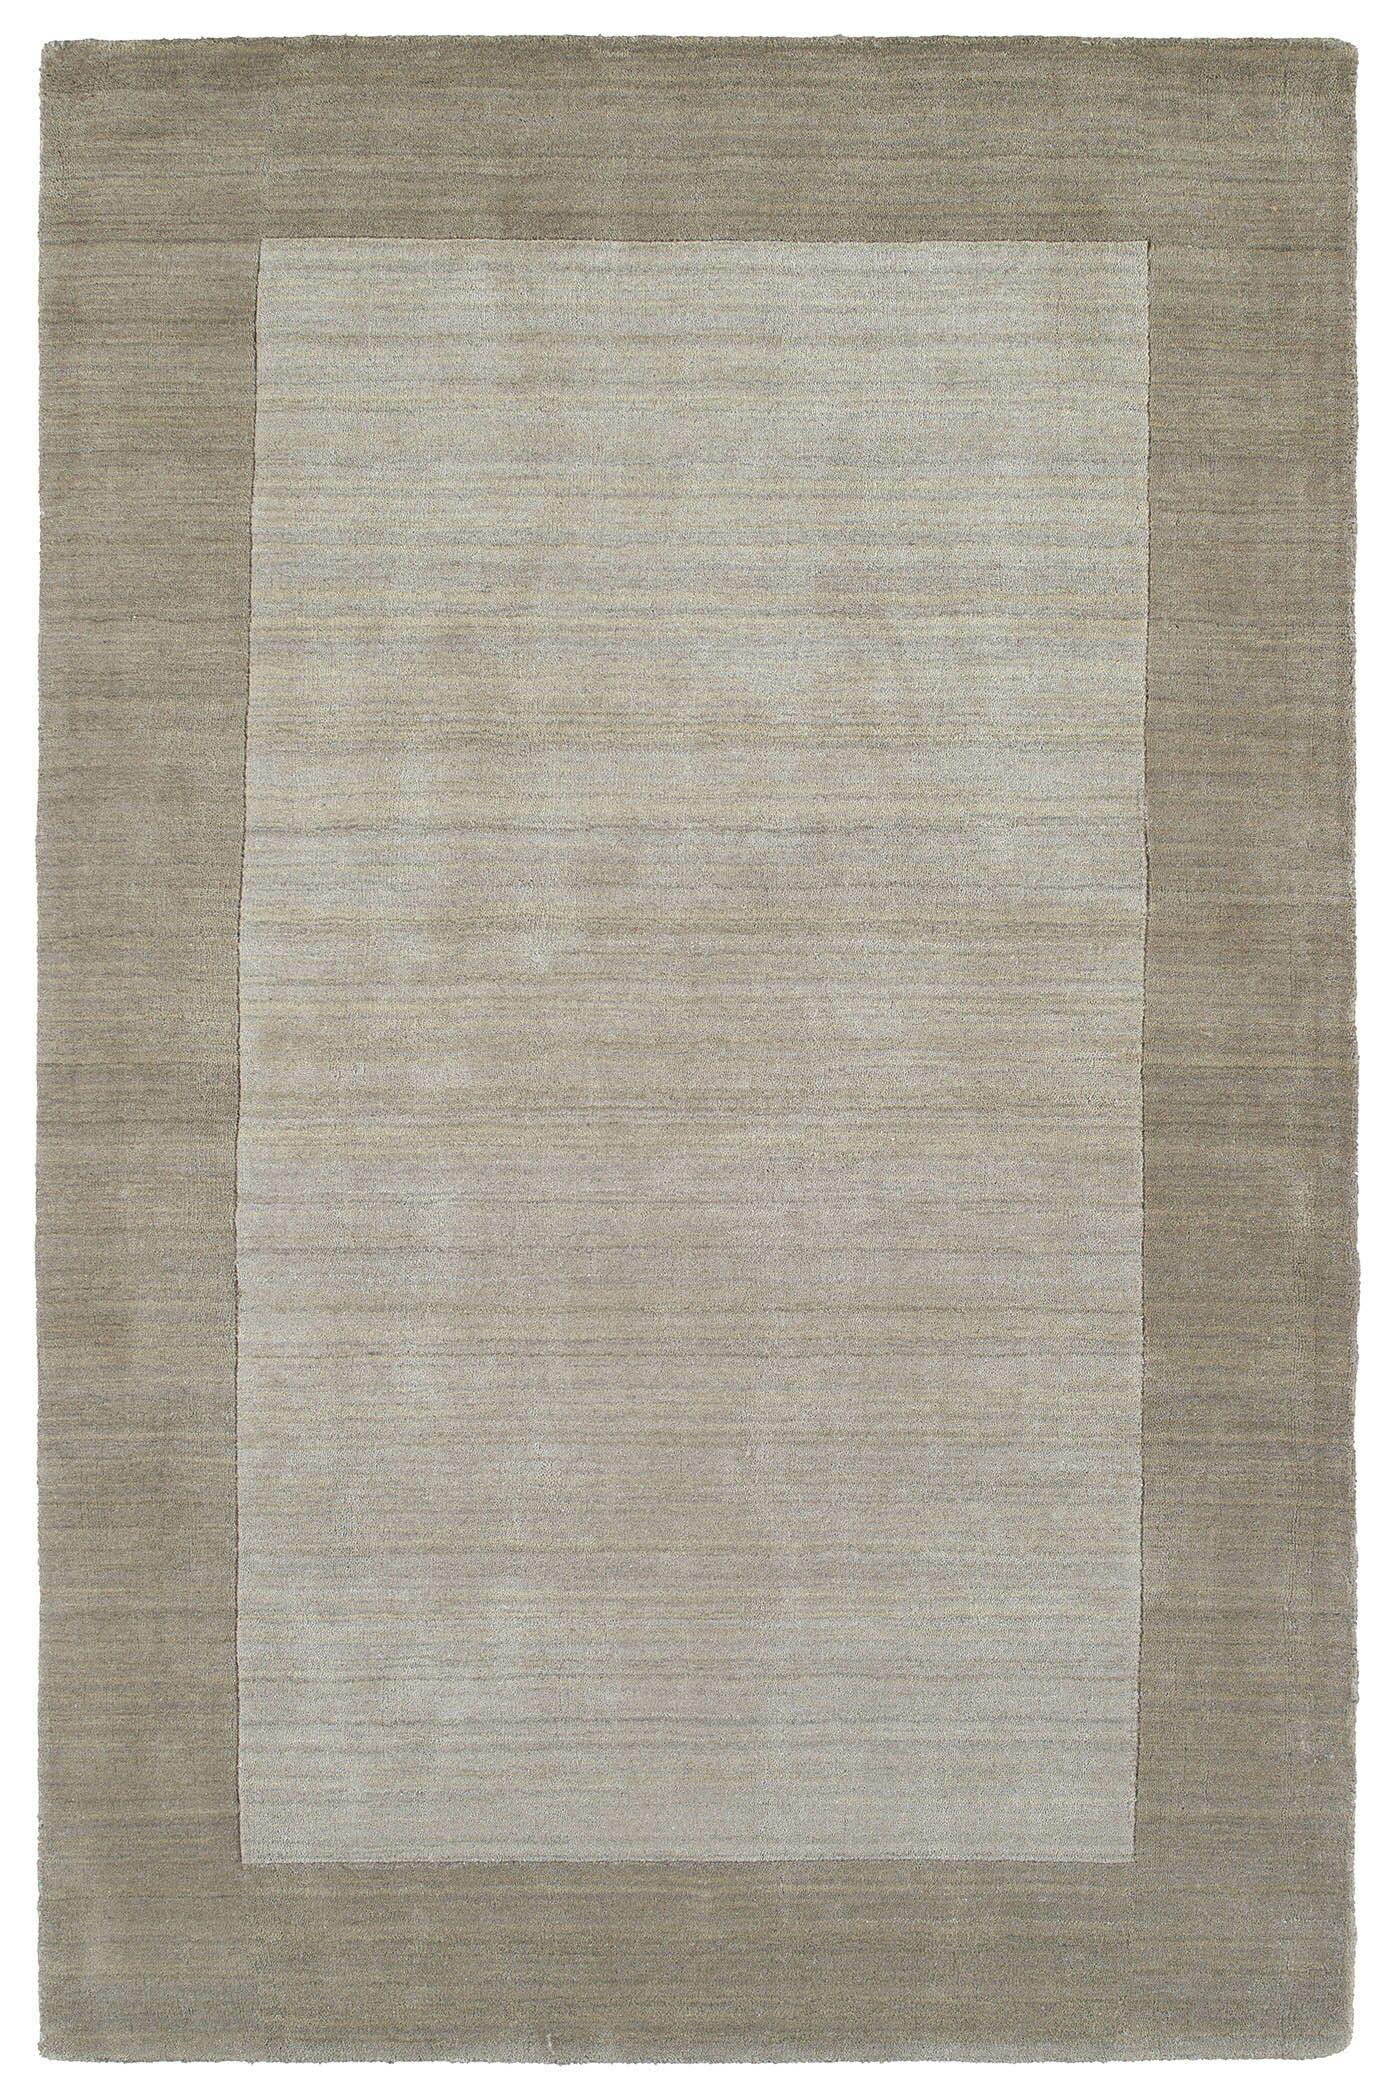 Barnard Hand Woven Wool Ivory/Beige Area Rug Rug Size: Rectangle 5' x 7'9